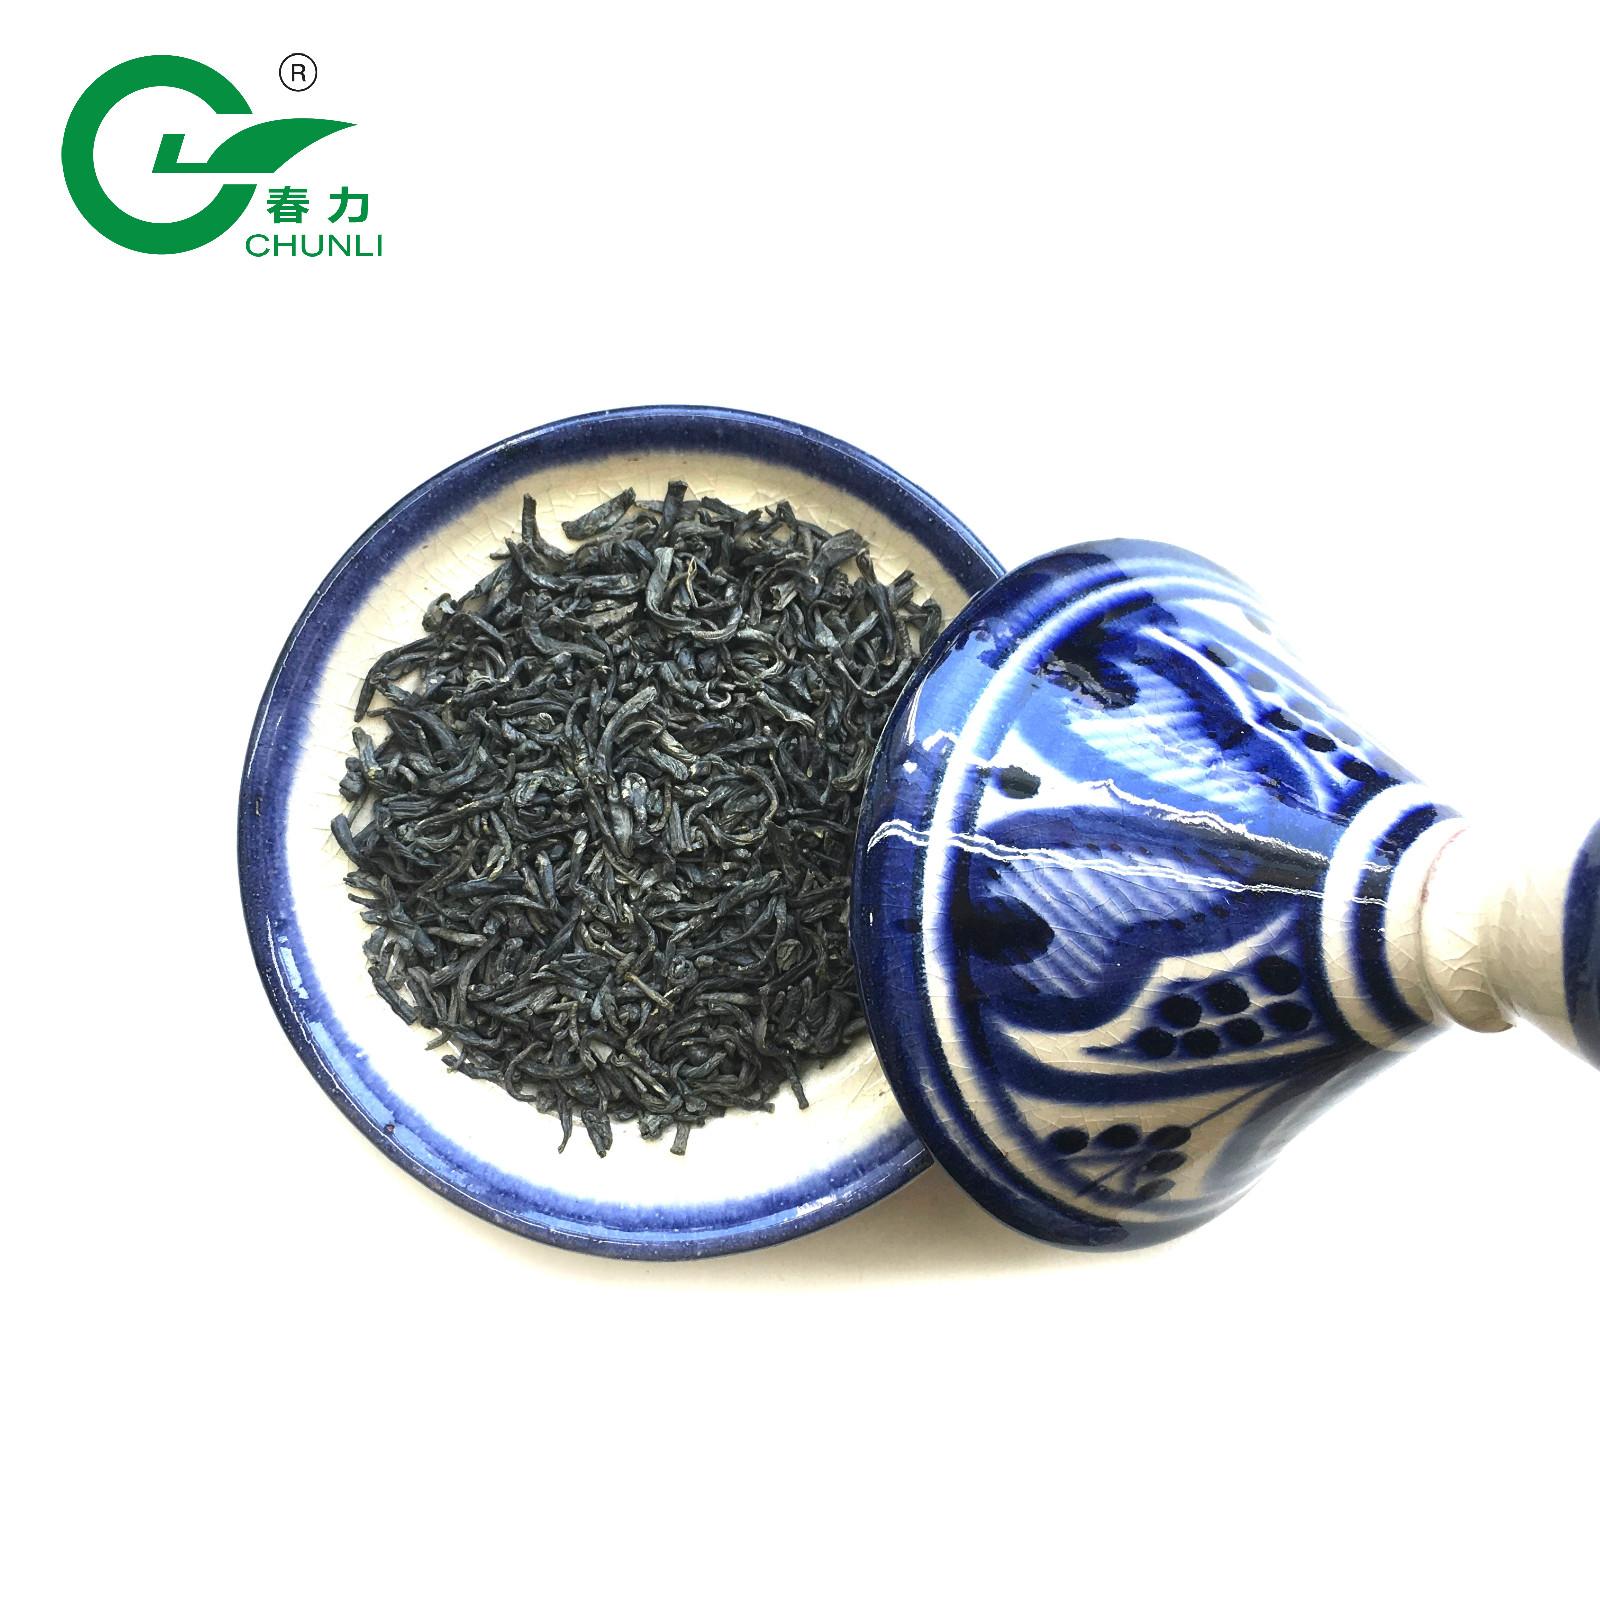 China Tea Wholesale Qualite Azawad Health Benefits Chunmee Green Tea the vert Algeria Mauritania Mali - 4uTea | 4uTea.com